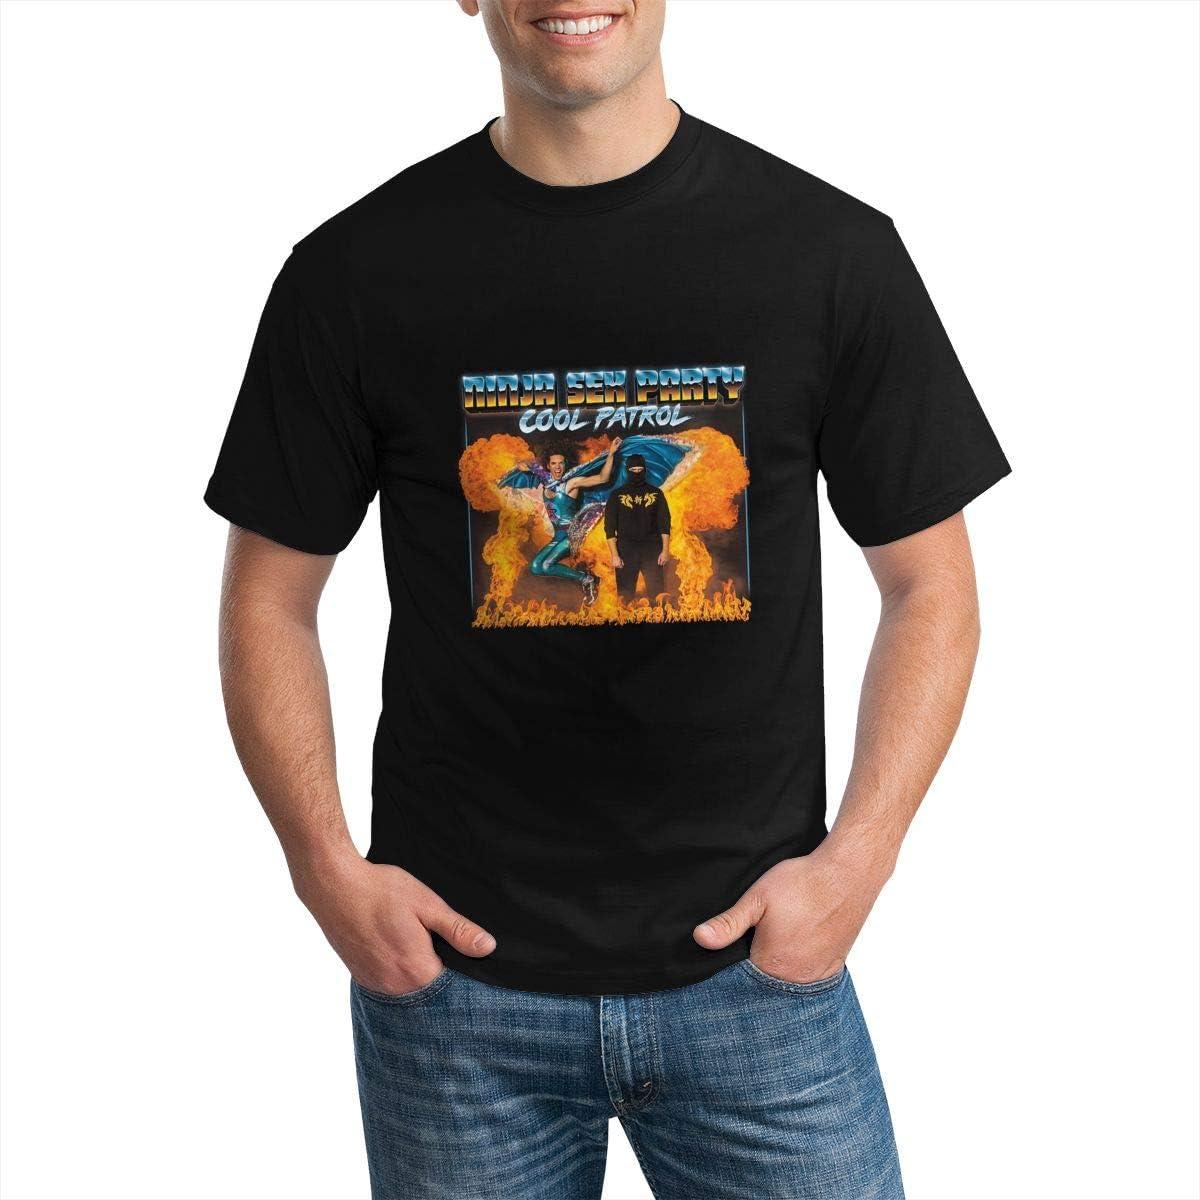 Ninja Sex Party Band T Shirt Men's Stylish Short Sleeves Round Neck Tops